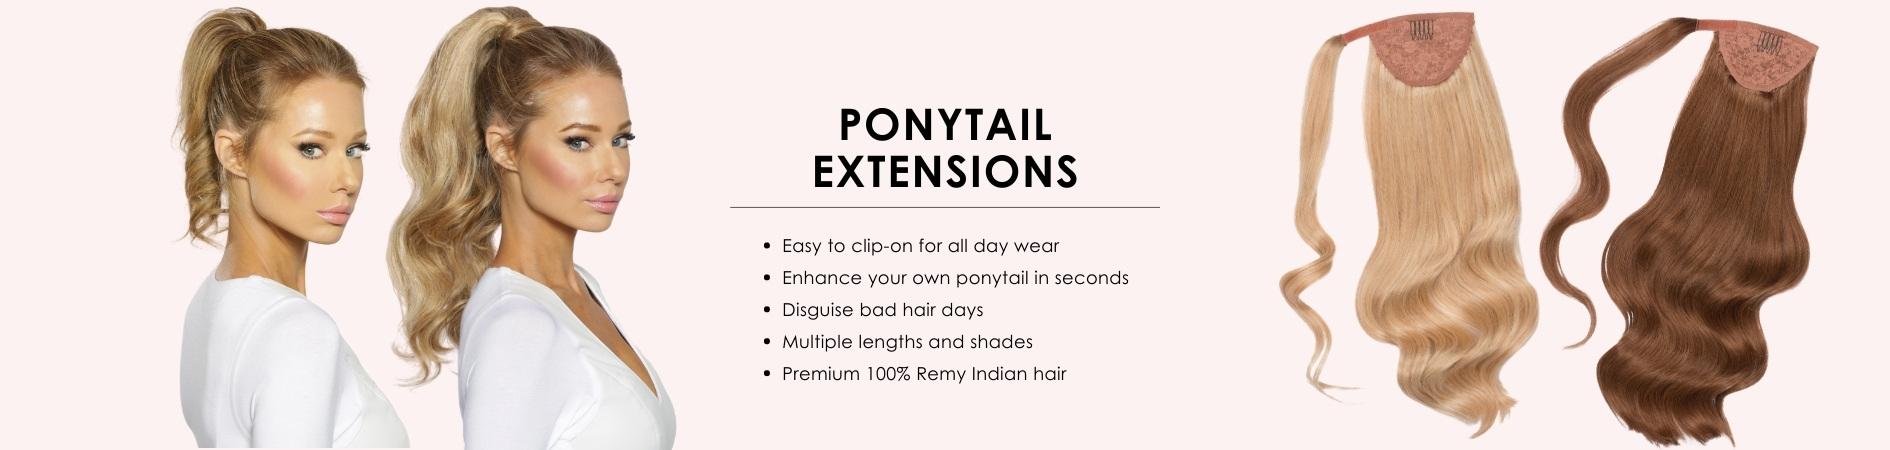 ponytail-2021.jpg